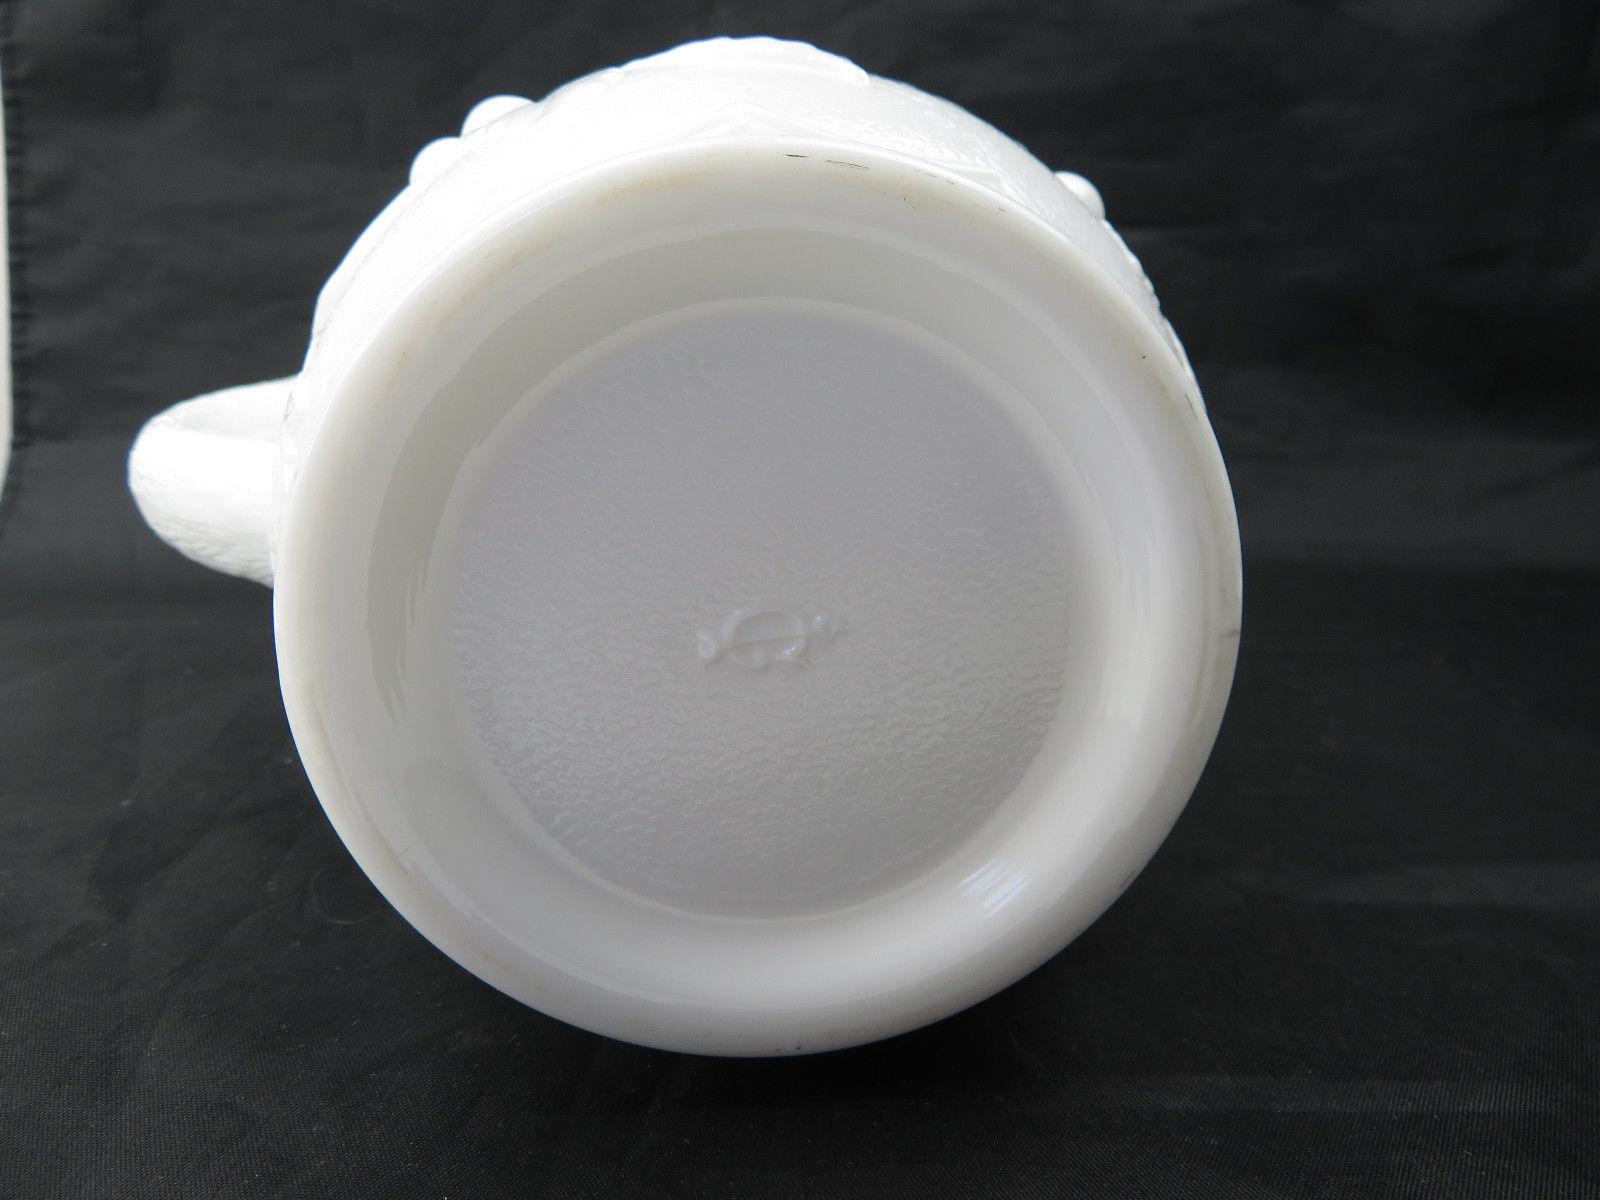 Vintage IG Imperial Grapes & Cable Milk Glass Pitcher Large Iced Tea Lemonade